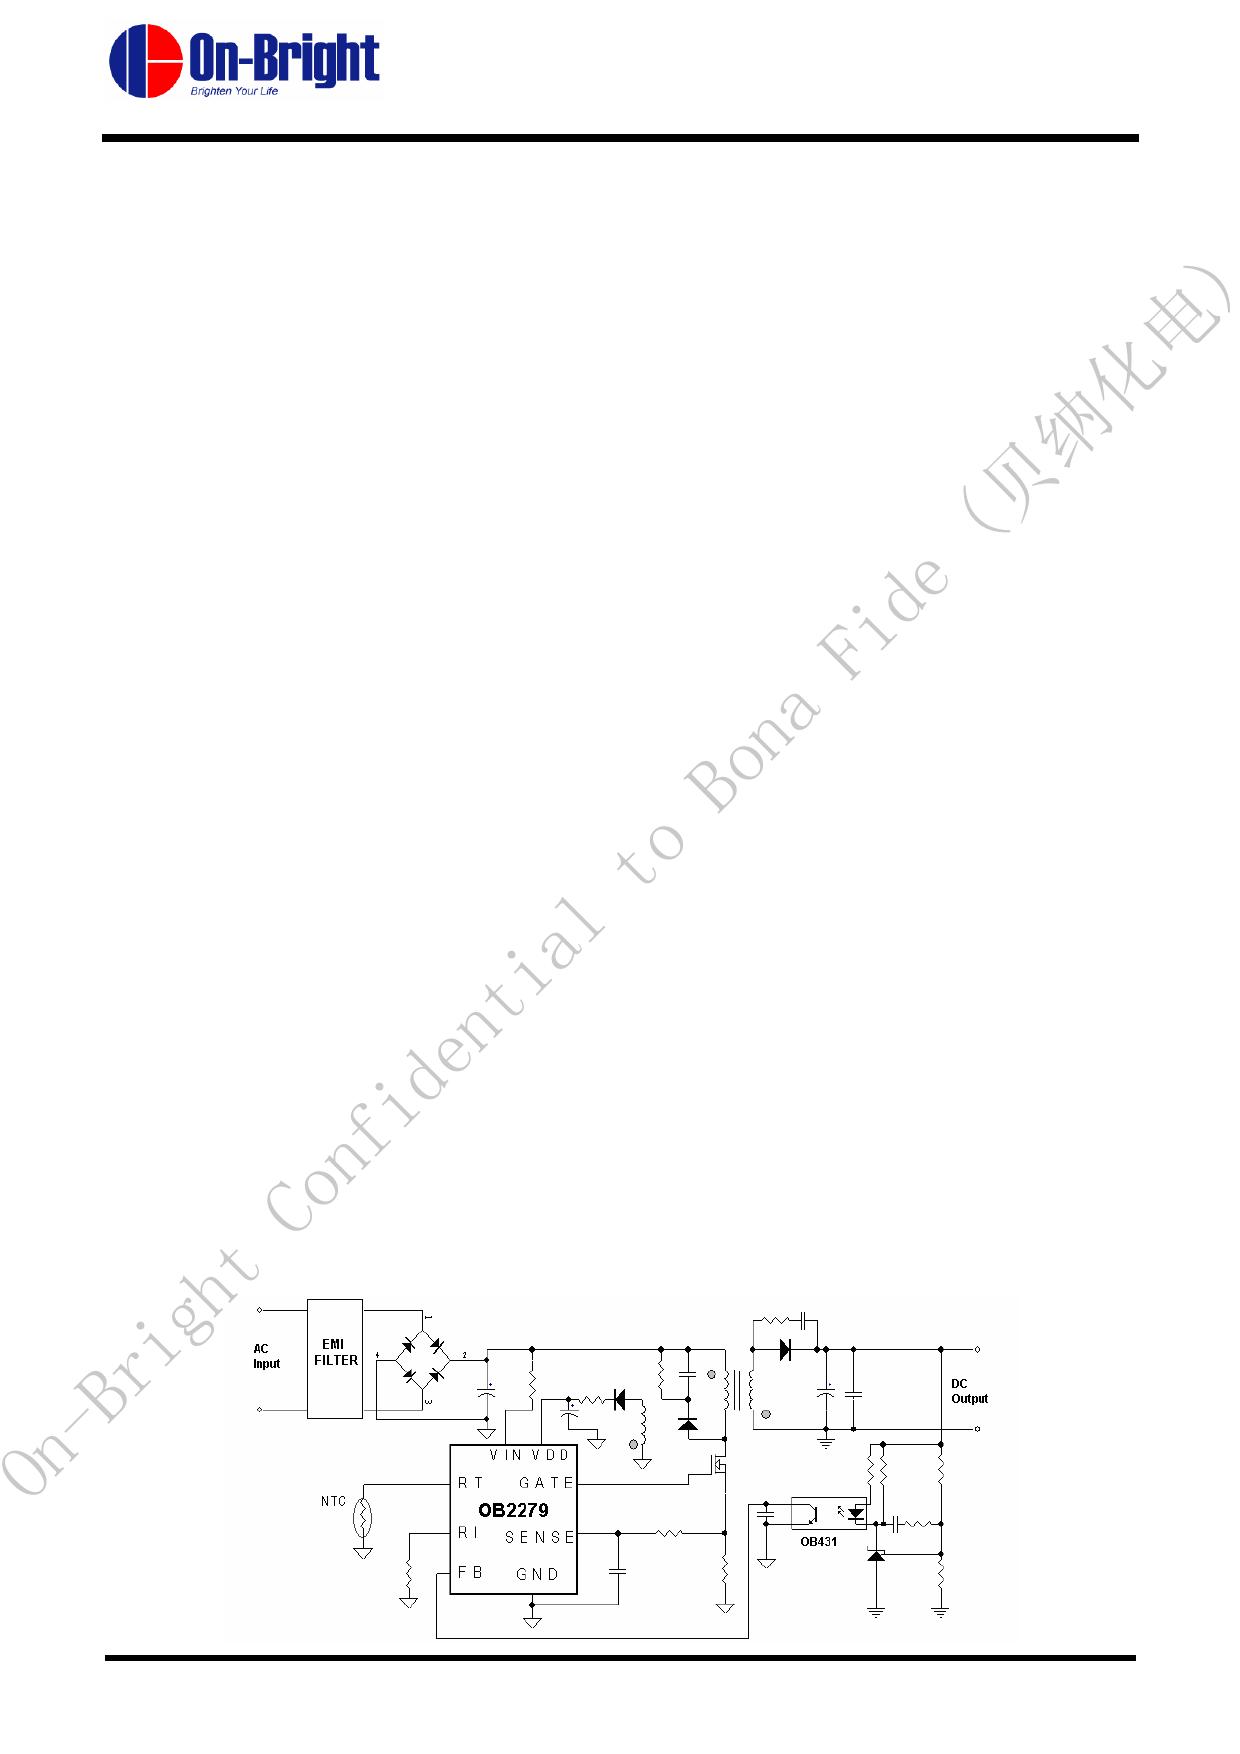 OB2279 image